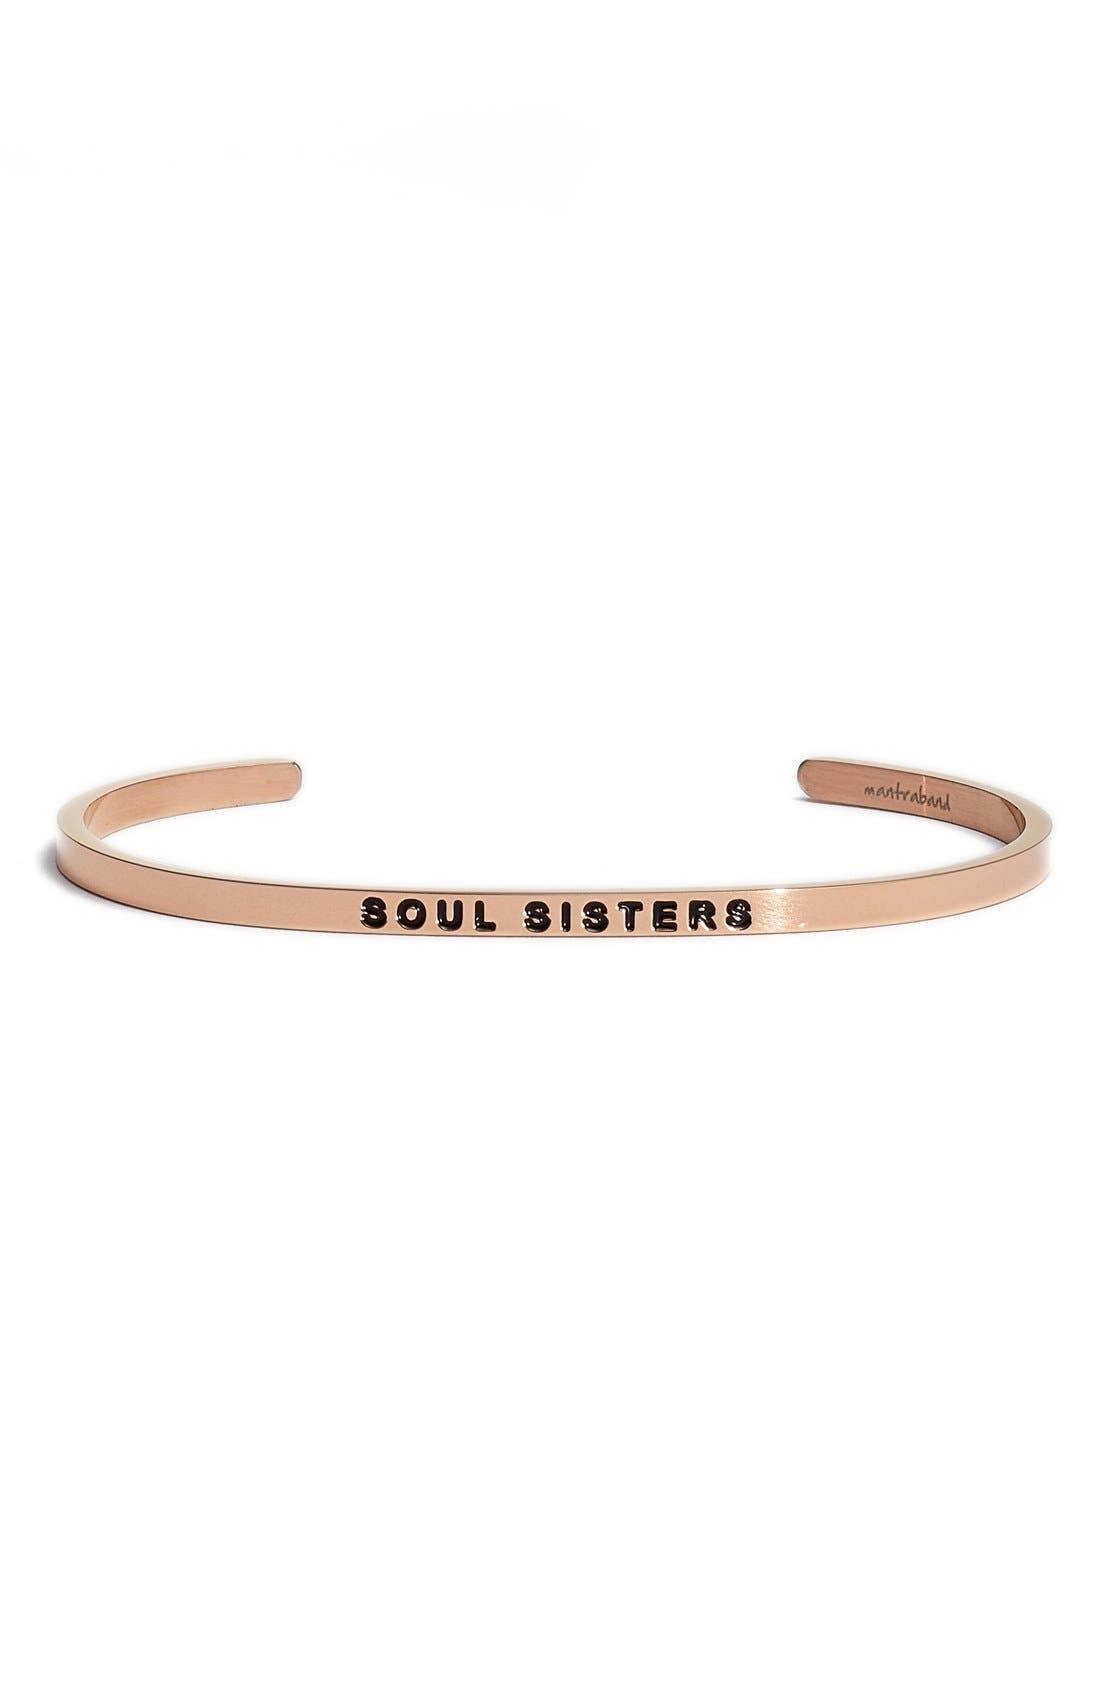 MantraBand® 'Soul Sister' Cuff